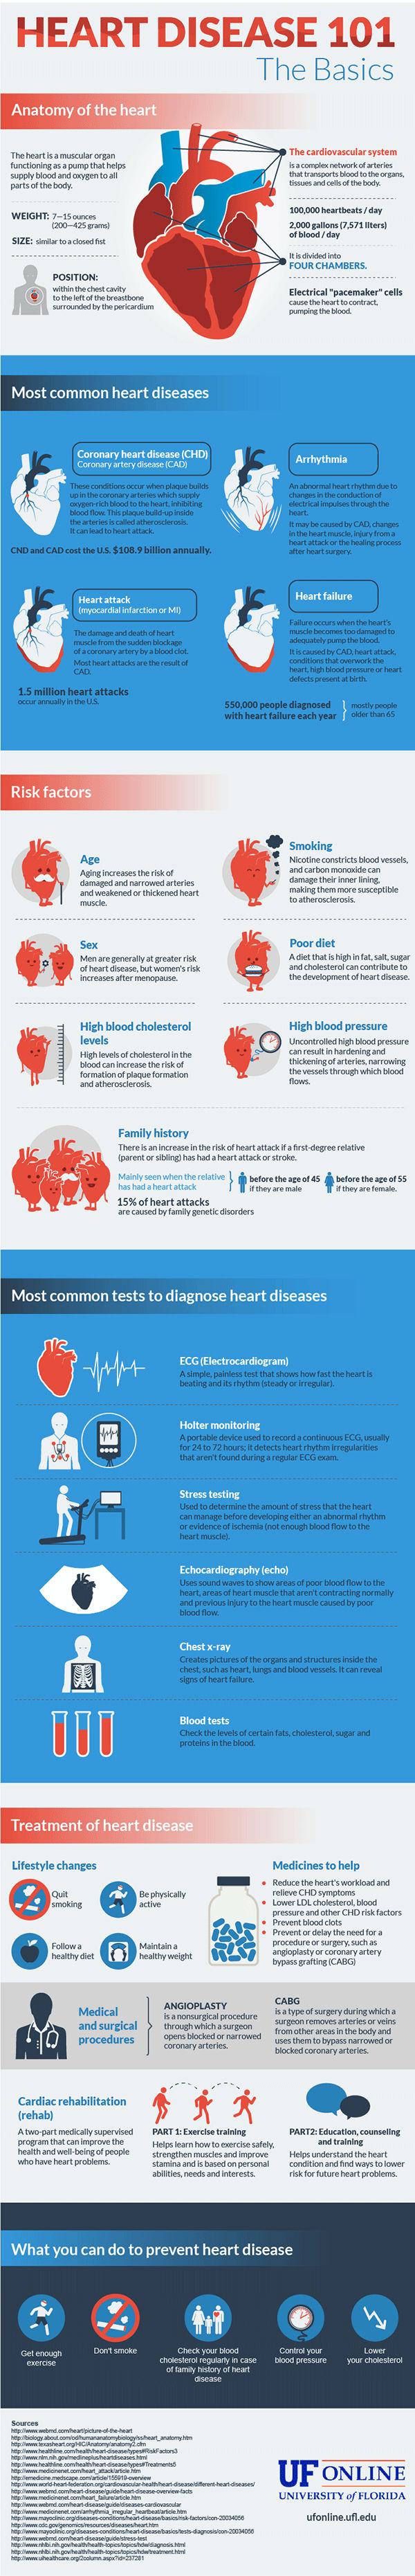 Heart Disease 101 [Infographic]